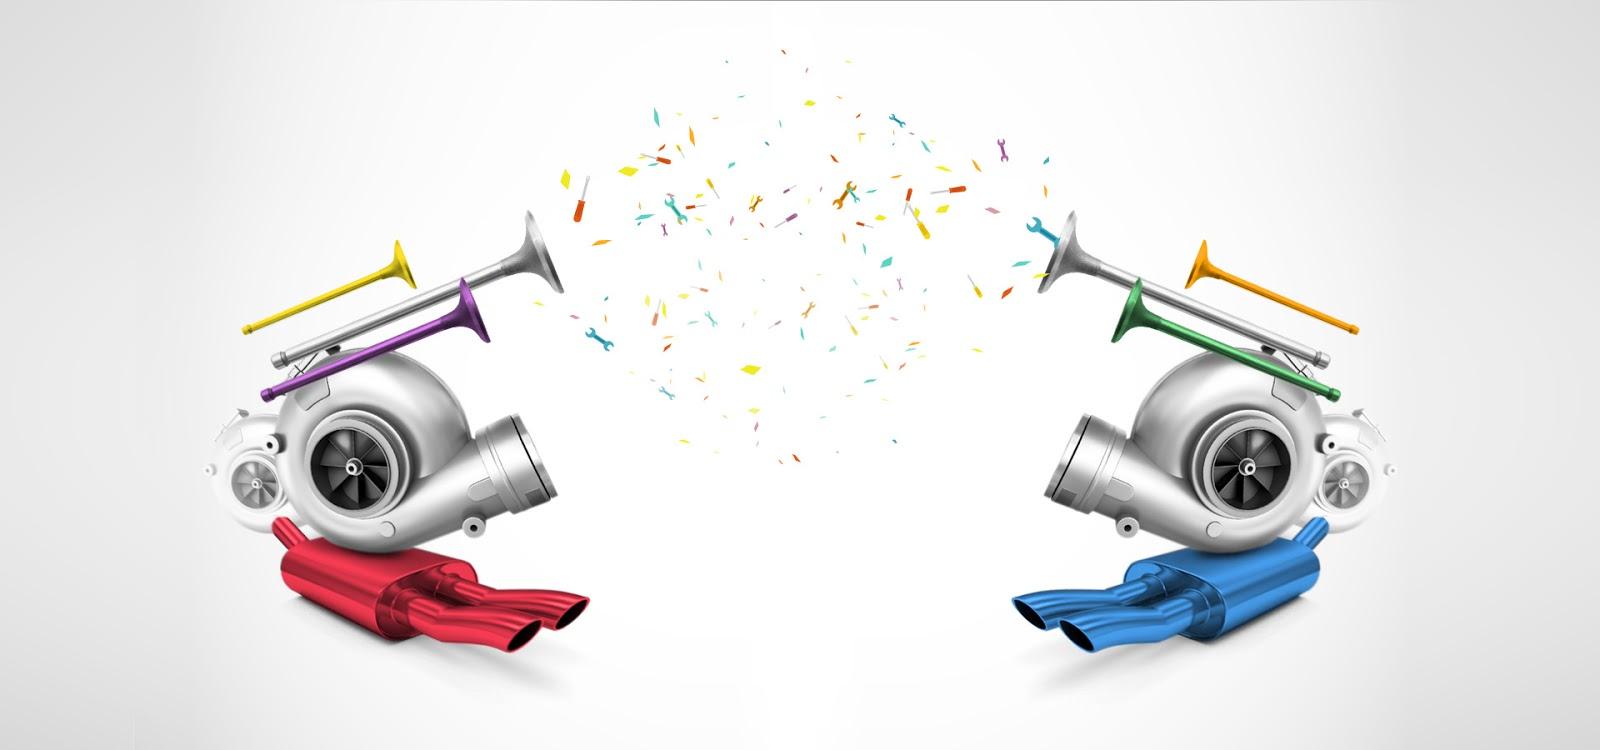 headertoyota Κέρδισε ένα πλήρες service για το Toyota σου service, Toyota, ΔΙΑΓΩΝΙΣΜΟΣ